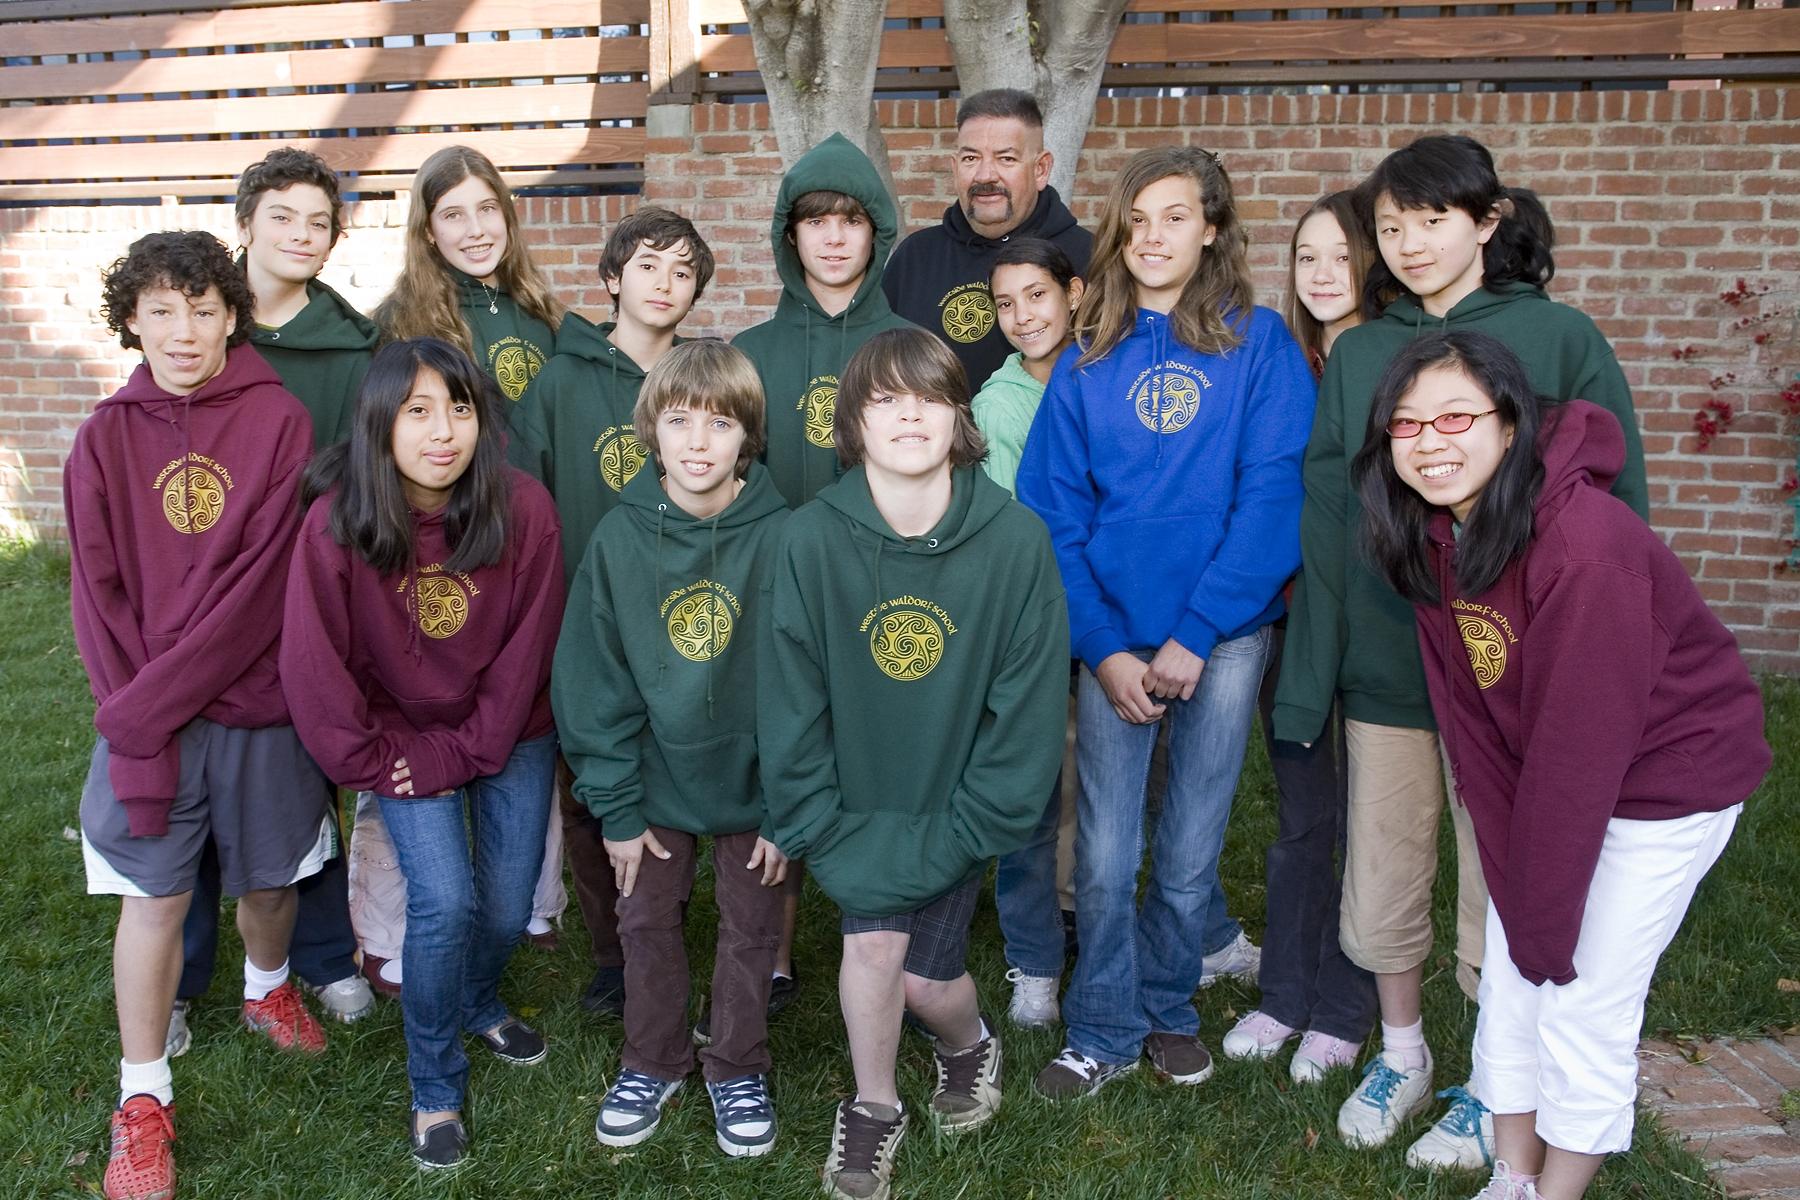 Worksheet Sixth Grade custom t shirts for sixth grade hoodies shirt design ideas photo